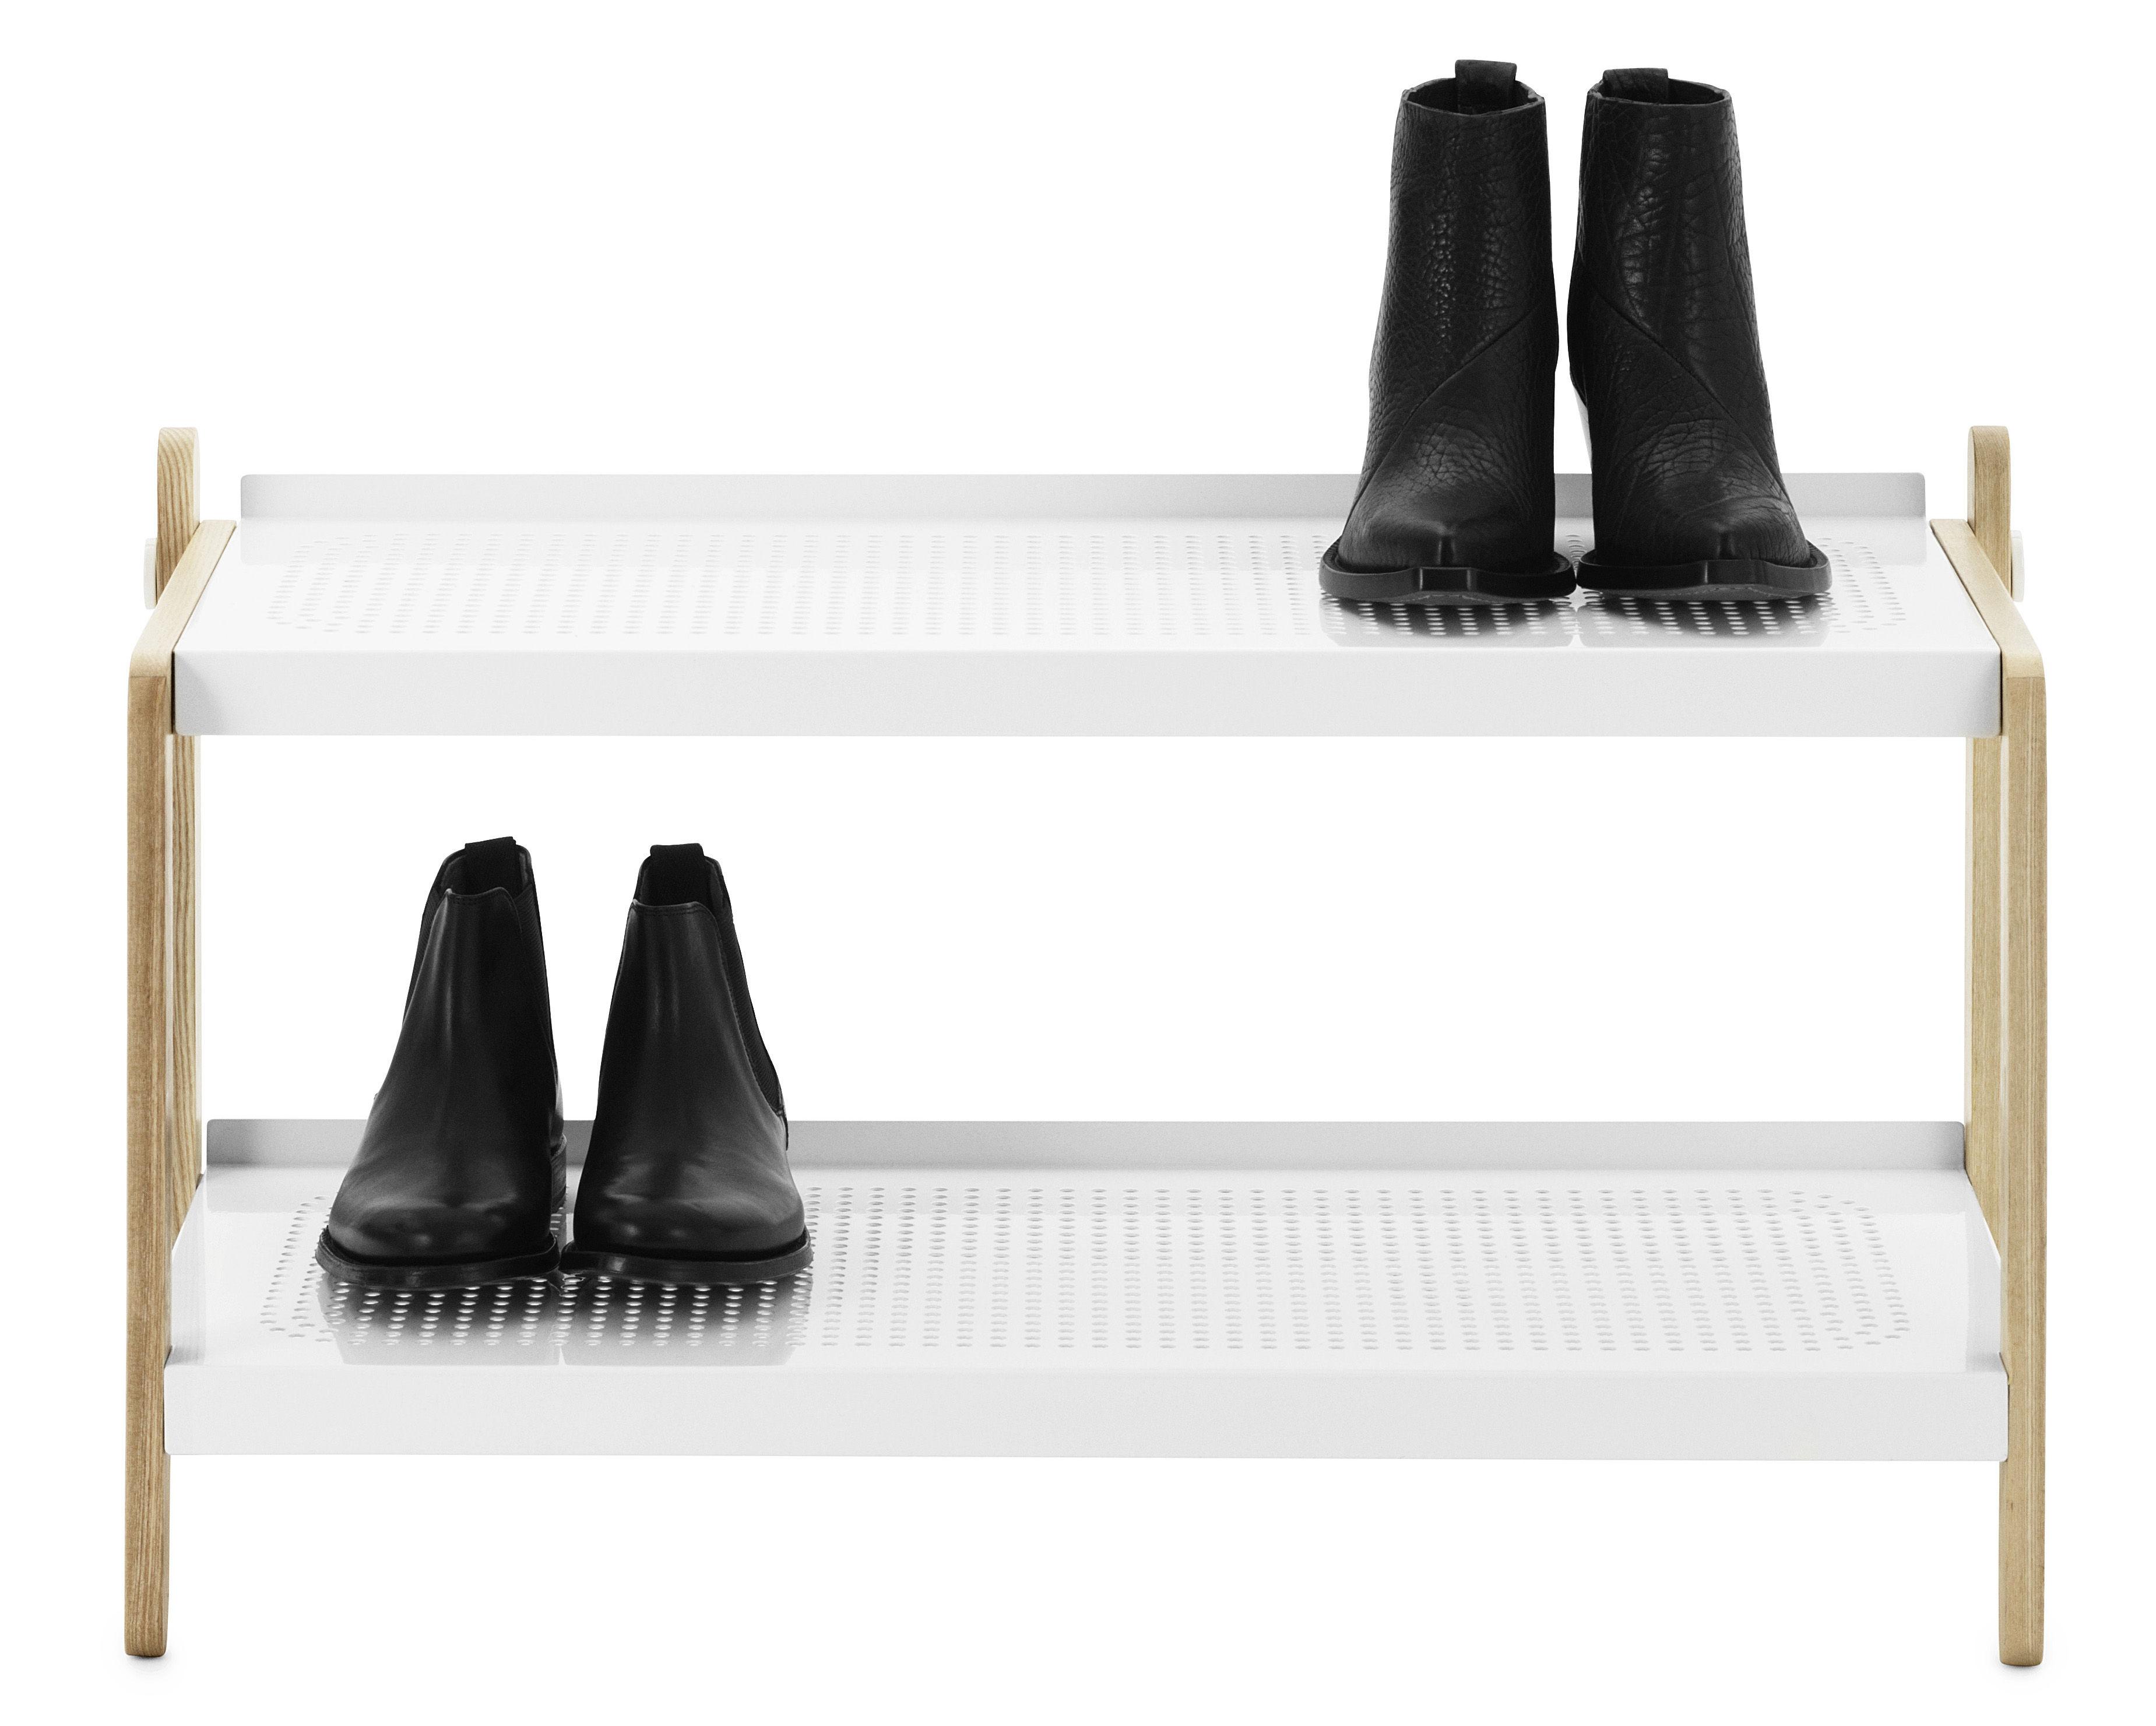 Furniture - Shelves & Storage Furniture - Sko Shoe rack by Normann Copenhagen - White - Ashwood, Painted steel